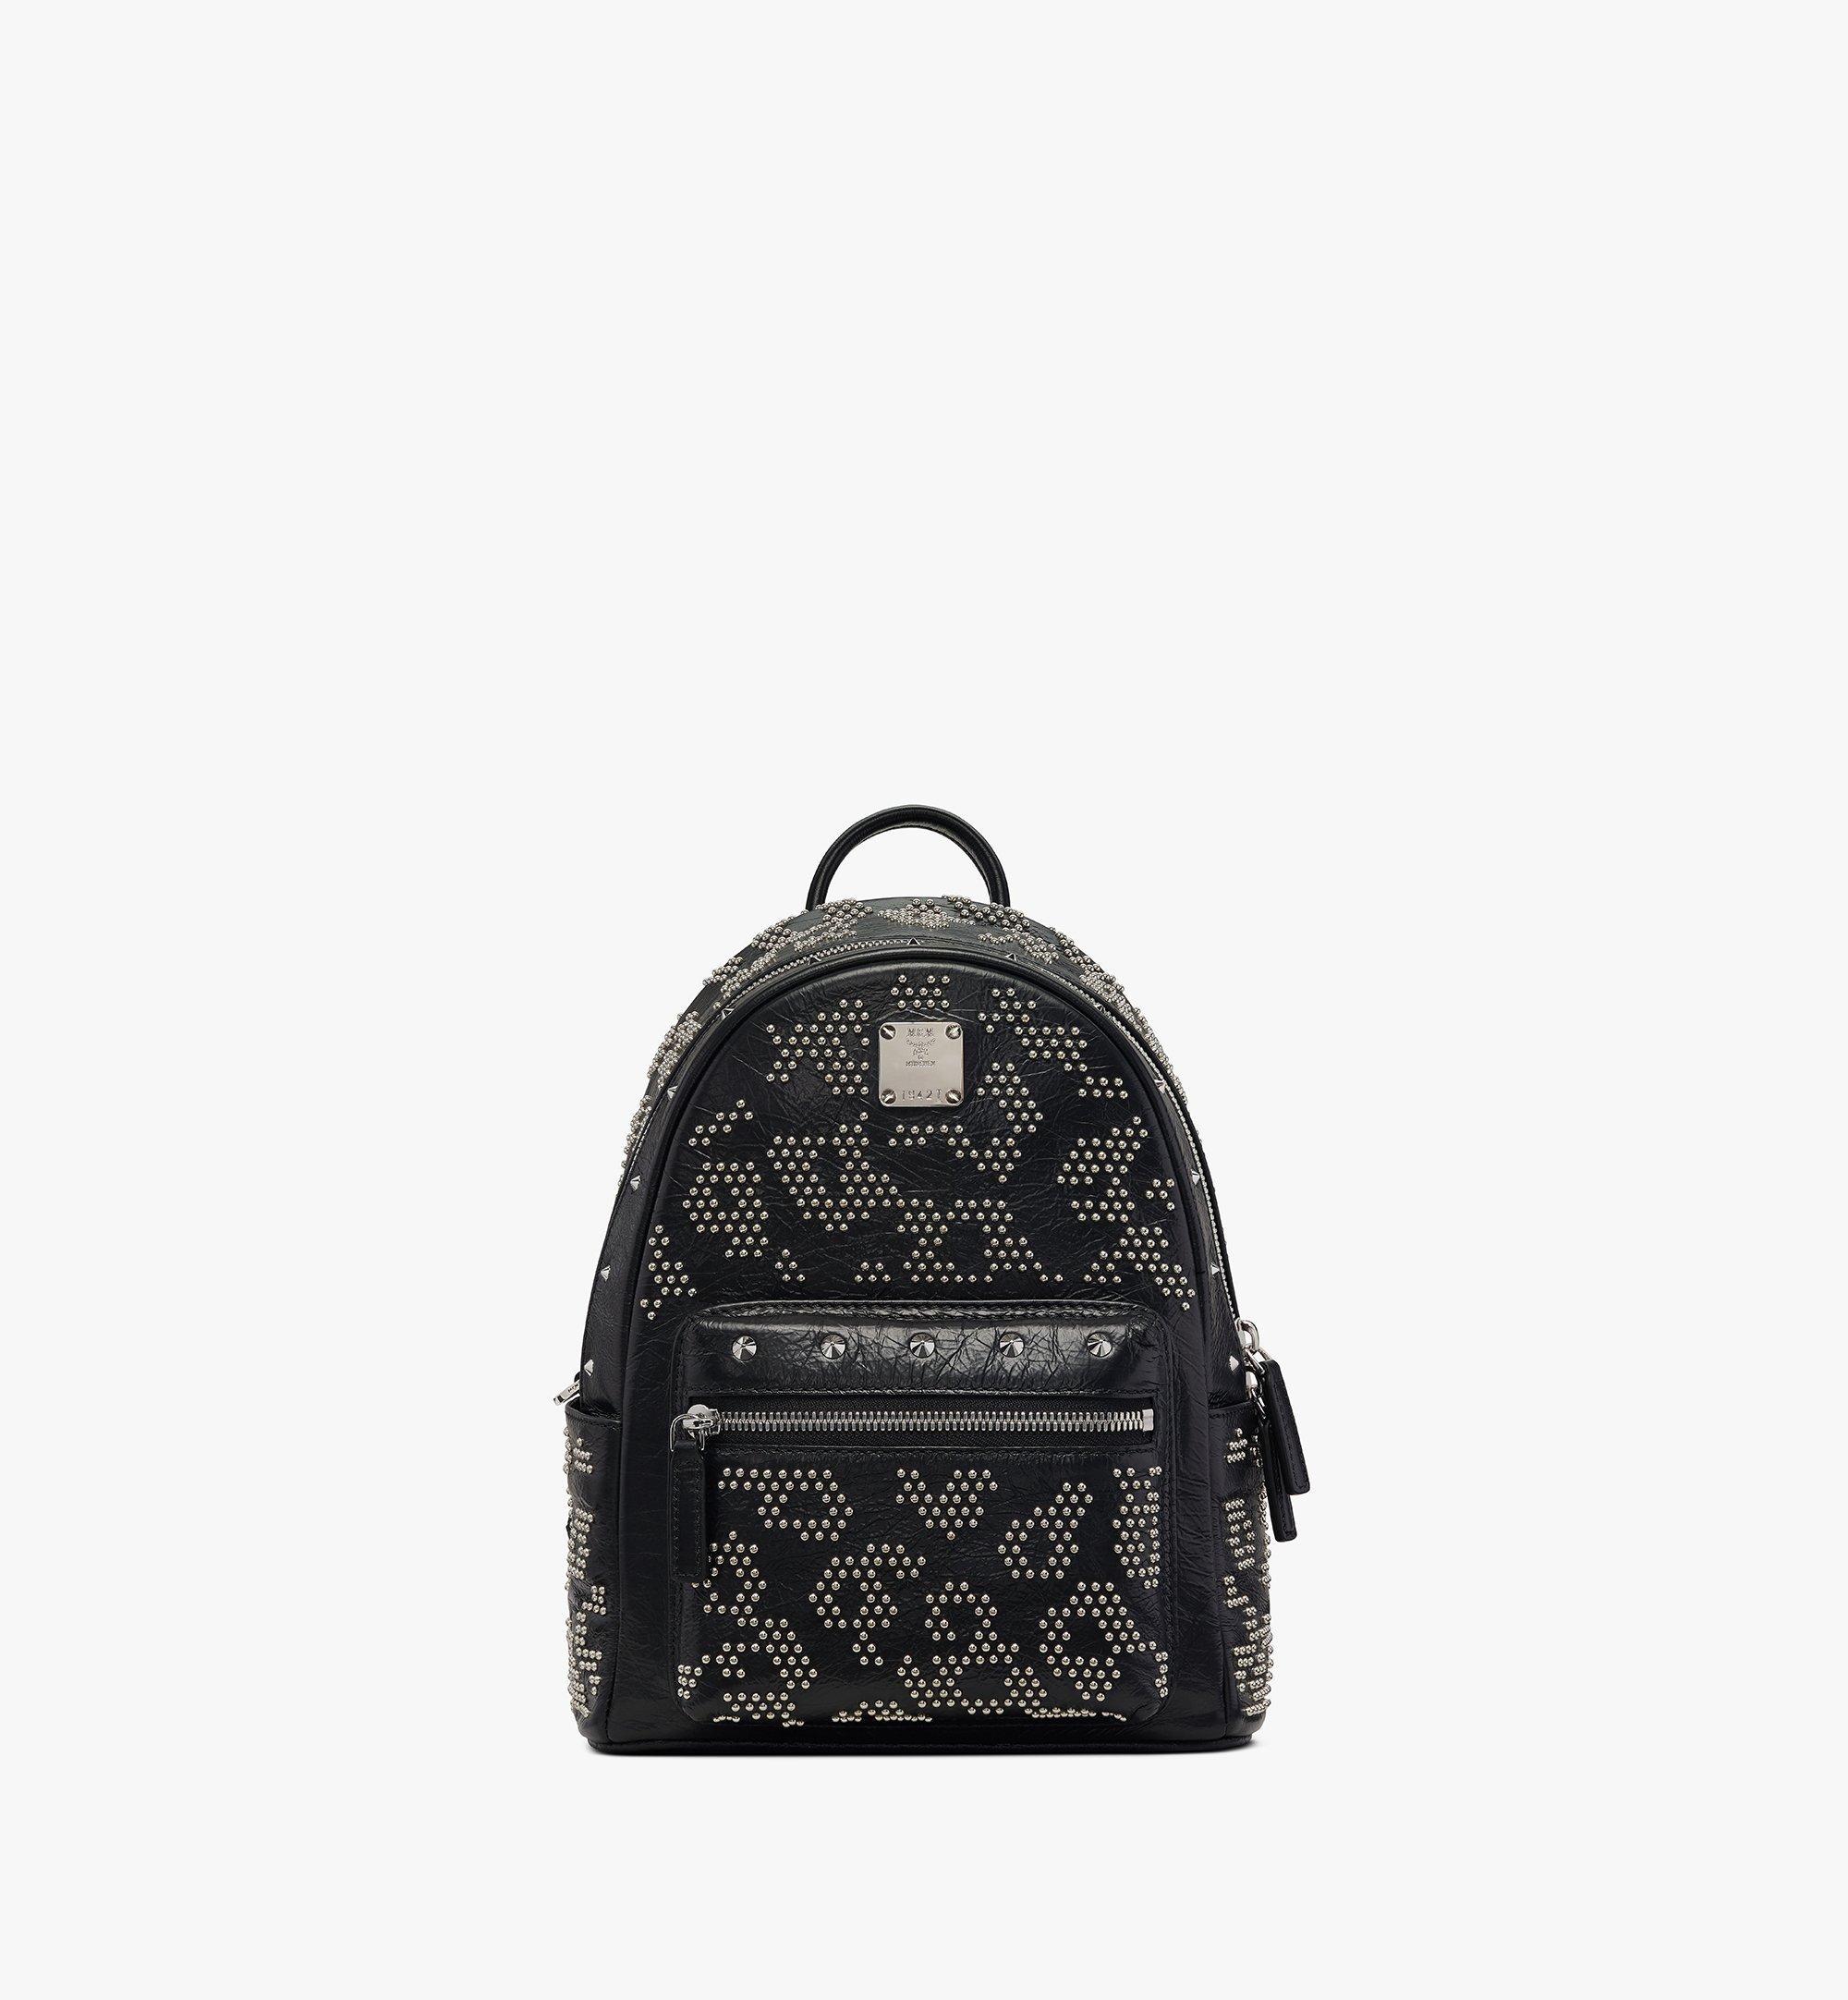 MCM Stark Backpack in Studded Leopard Leather Black MWKASVE01BK001 Alternate View 1